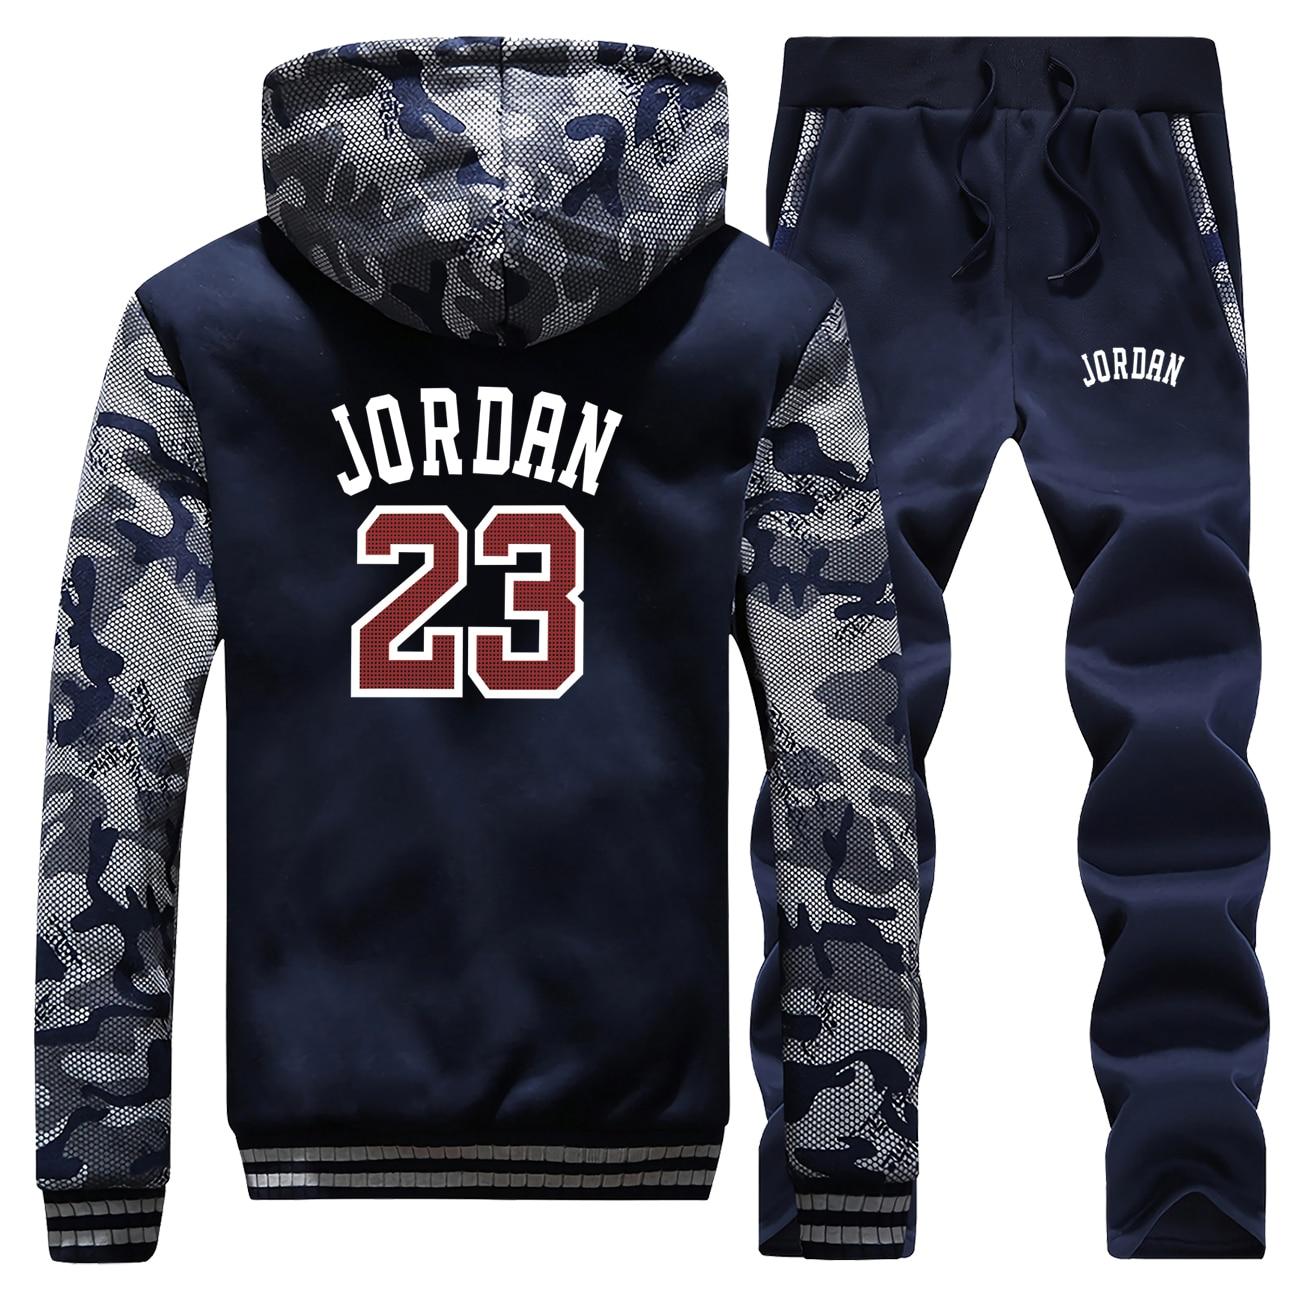 Winter 2019 New Coat Thick Men Hoodie Jordan 23 Print Suit Warm Jackets Mens Camouflage Fleece Sportswear+ Pants 2 Piece Set